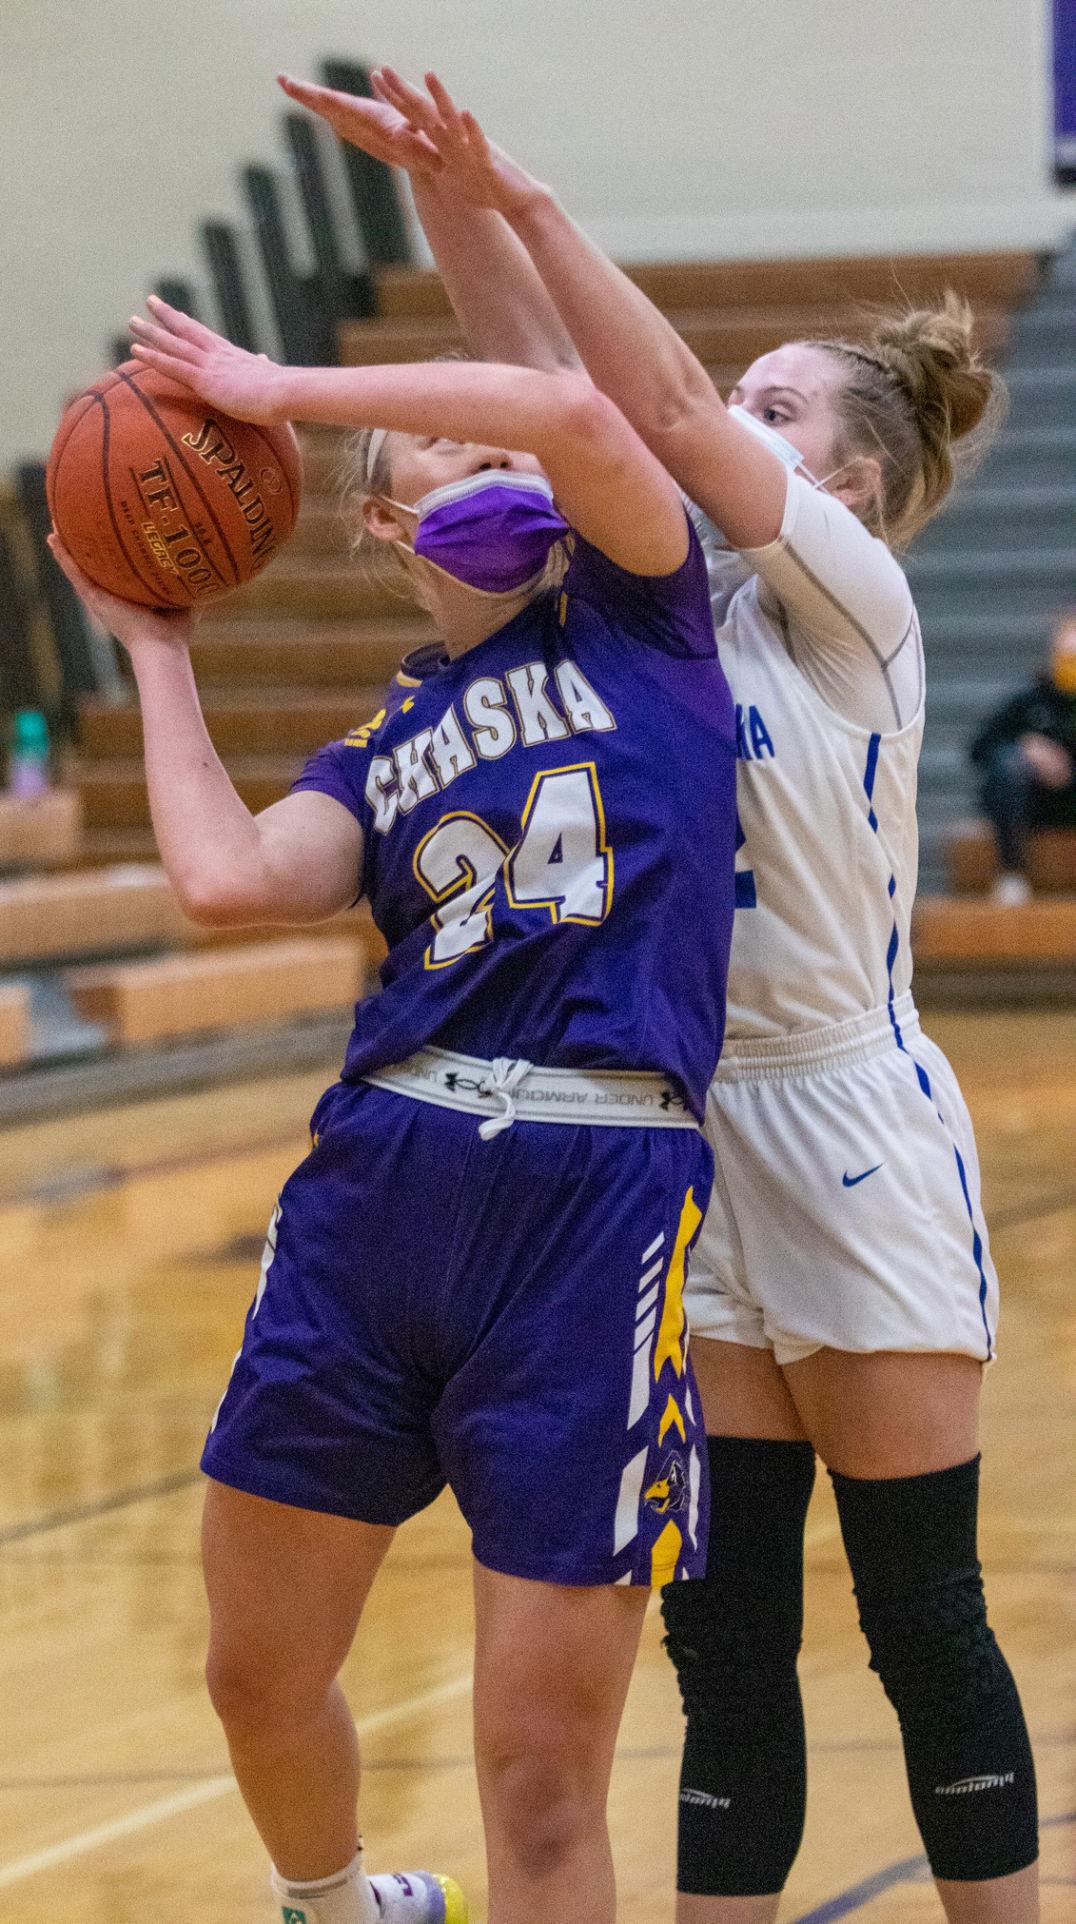 Chaska Basketball - Heyer